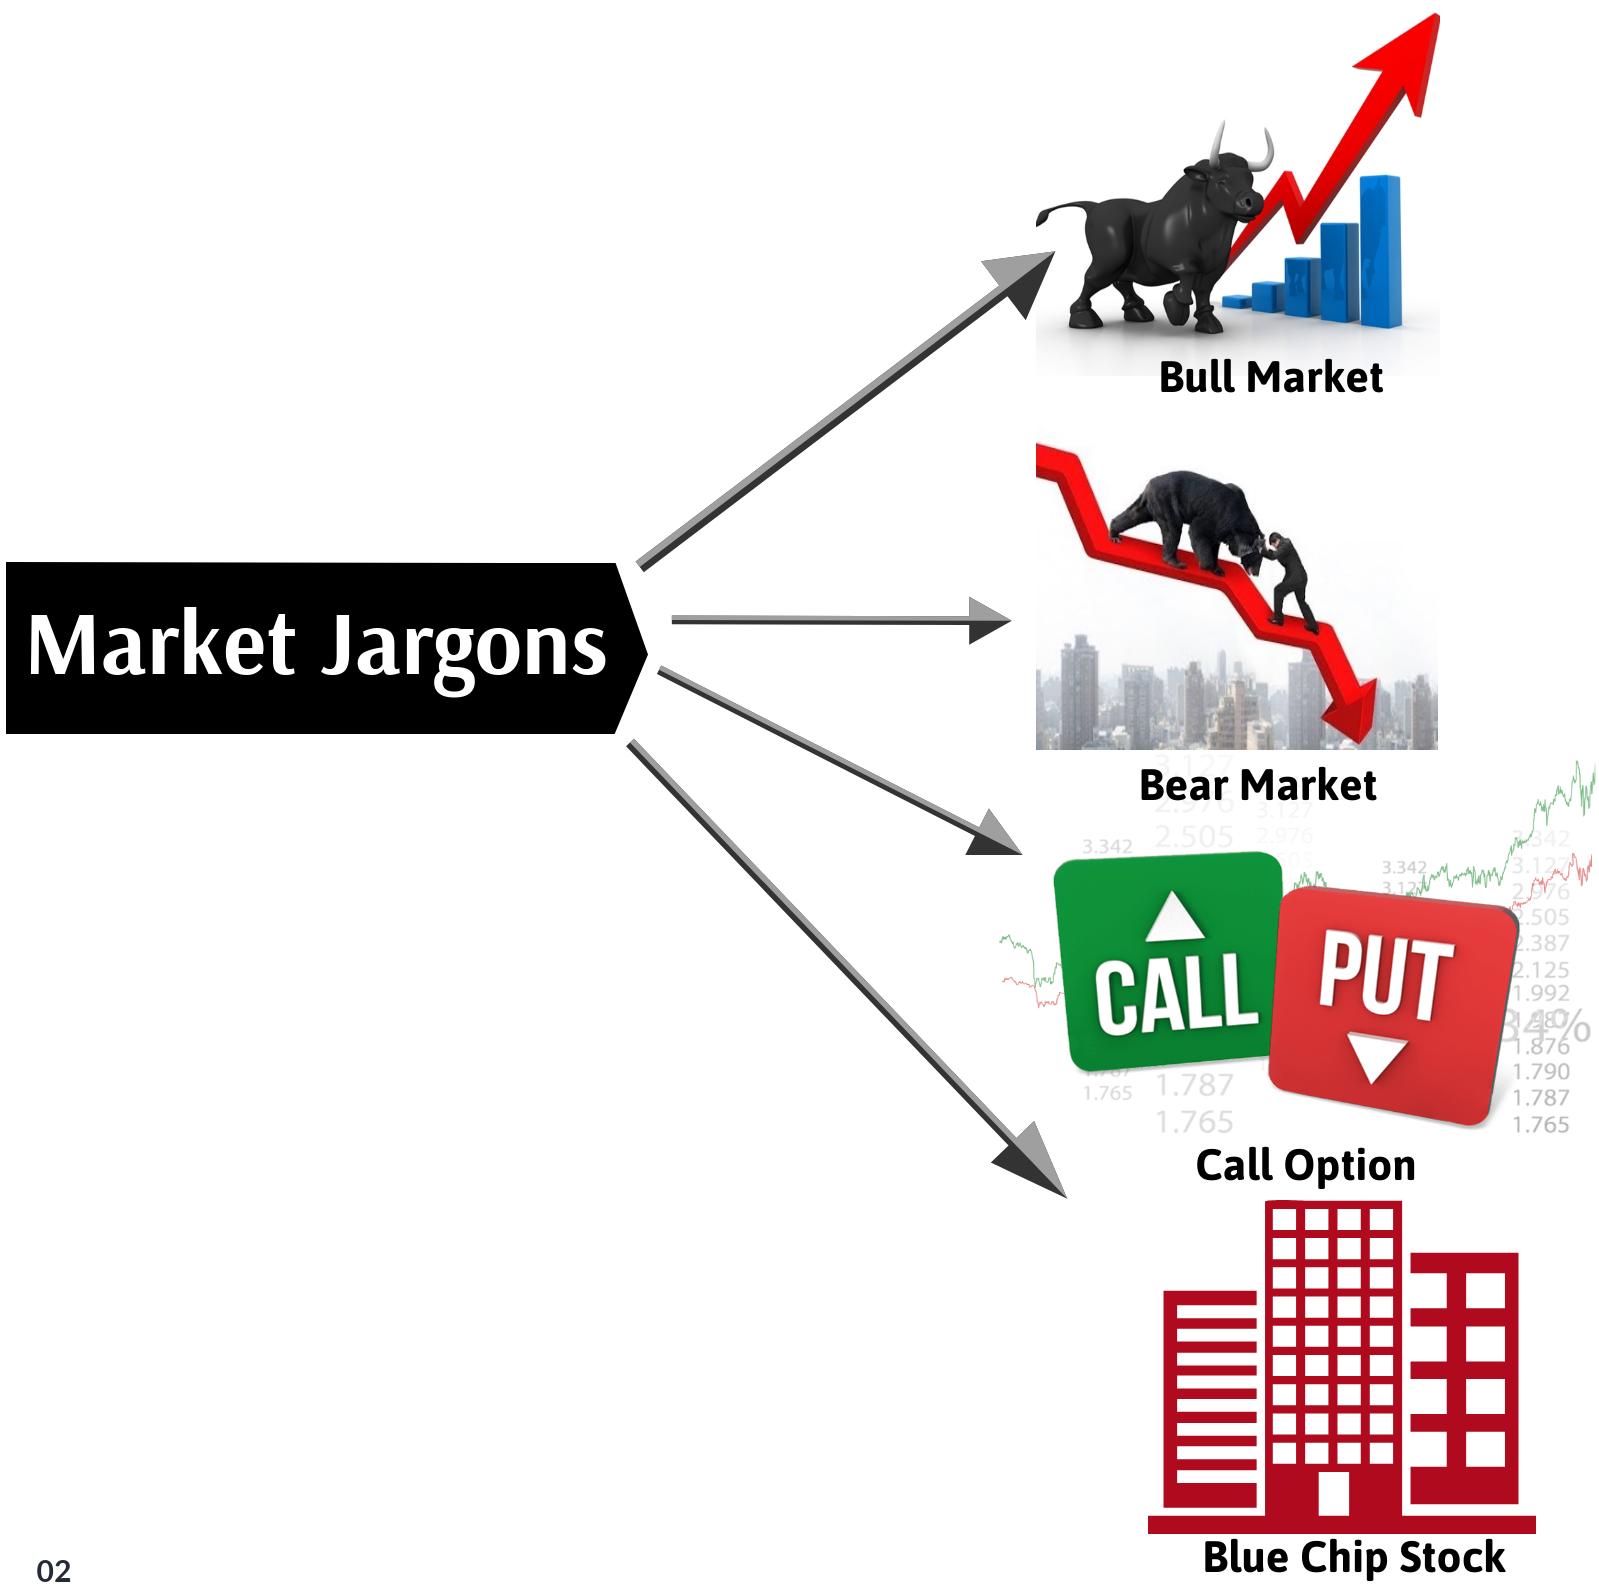 Market Jargons